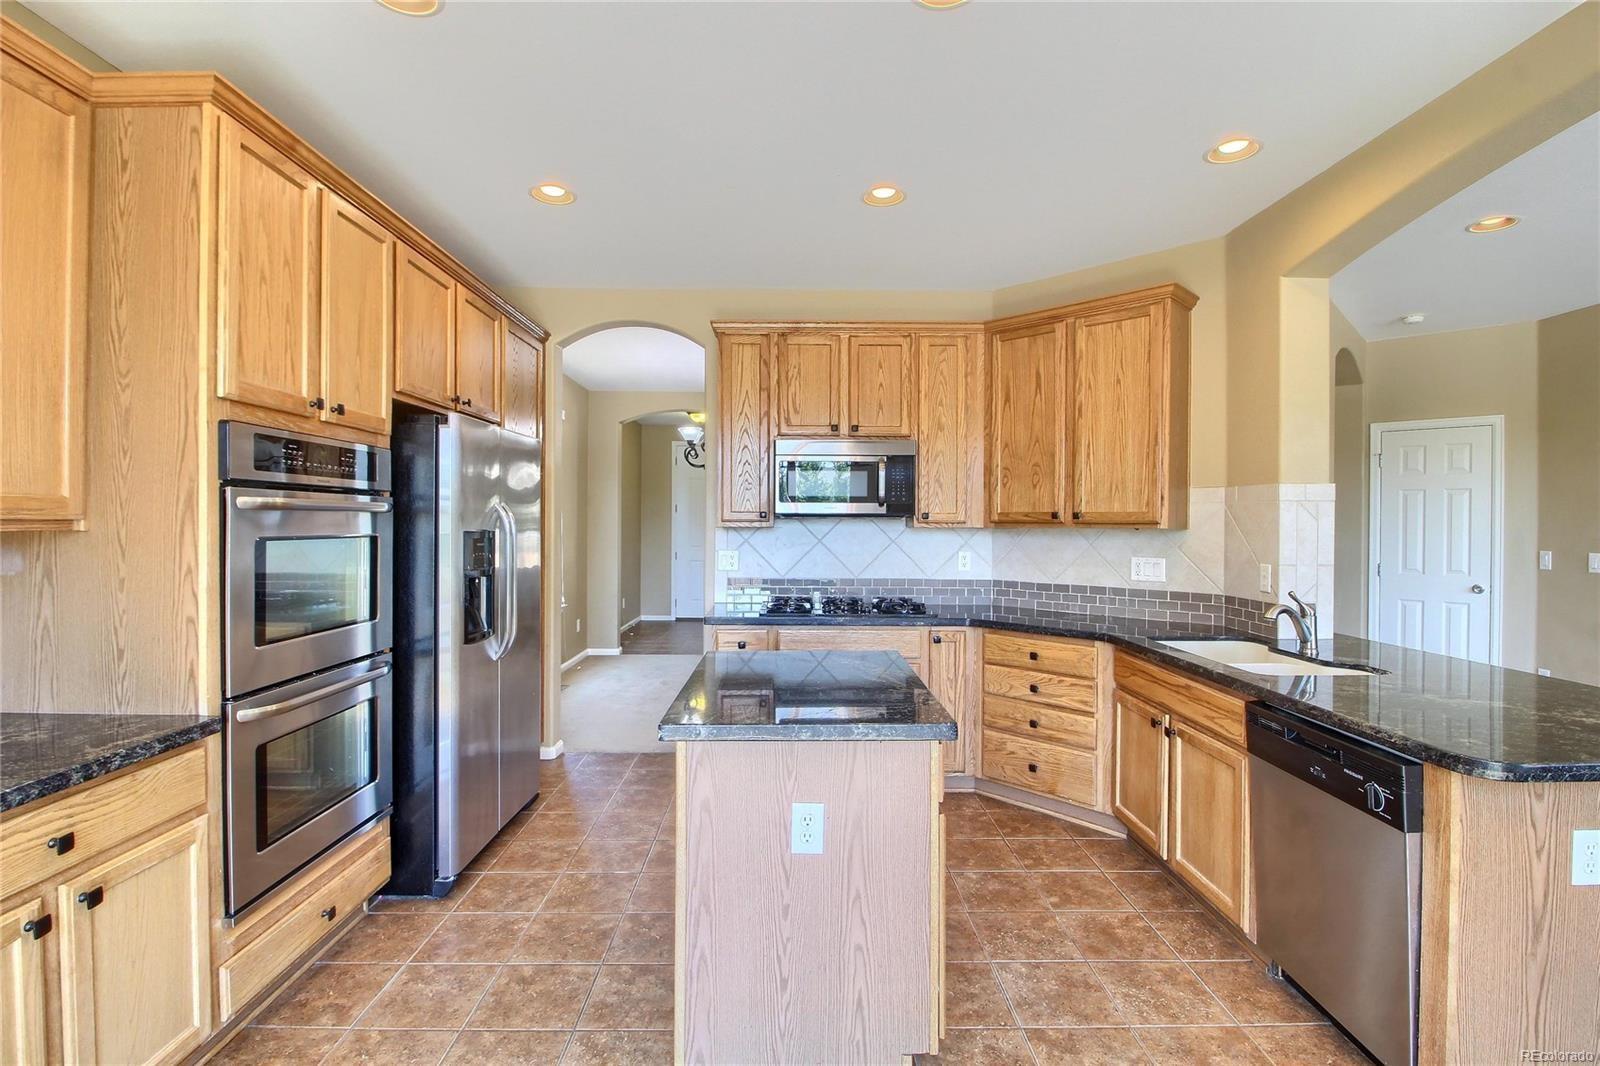 MLS# 3018887 - 5 - 10677 Cedarcrest Circle, Highlands Ranch, CO 80130